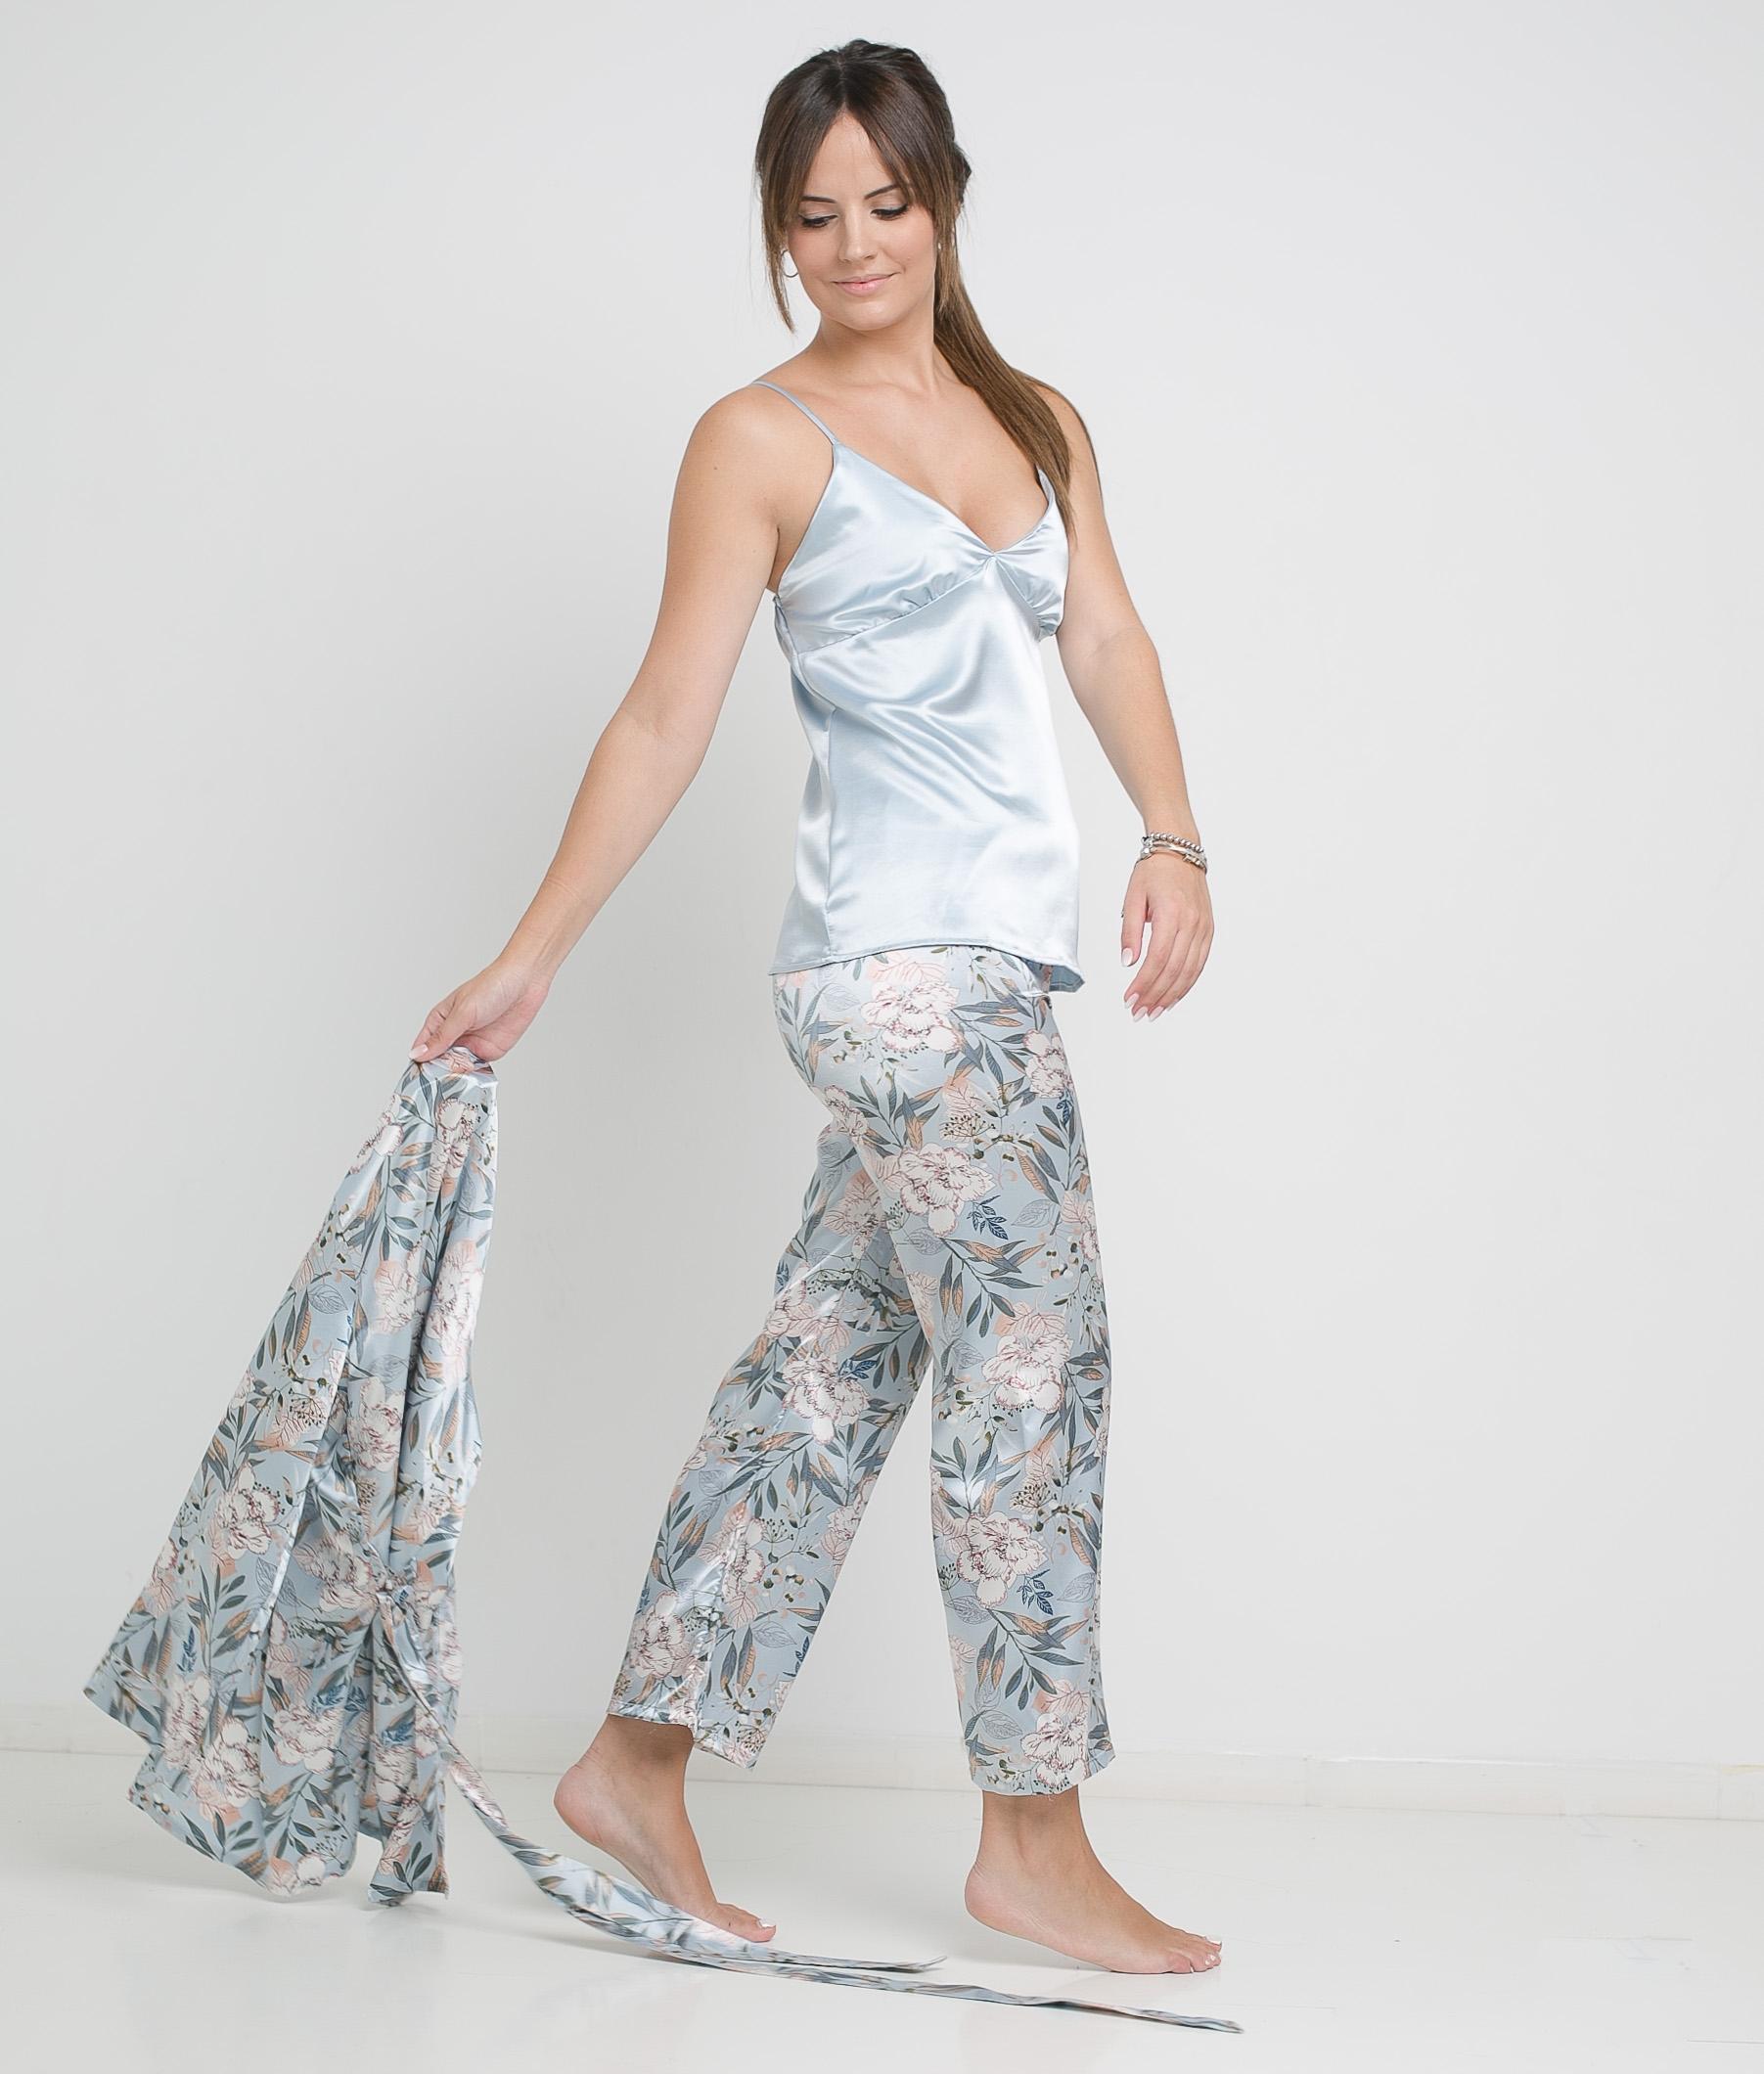 Pijama Vorel - Azul